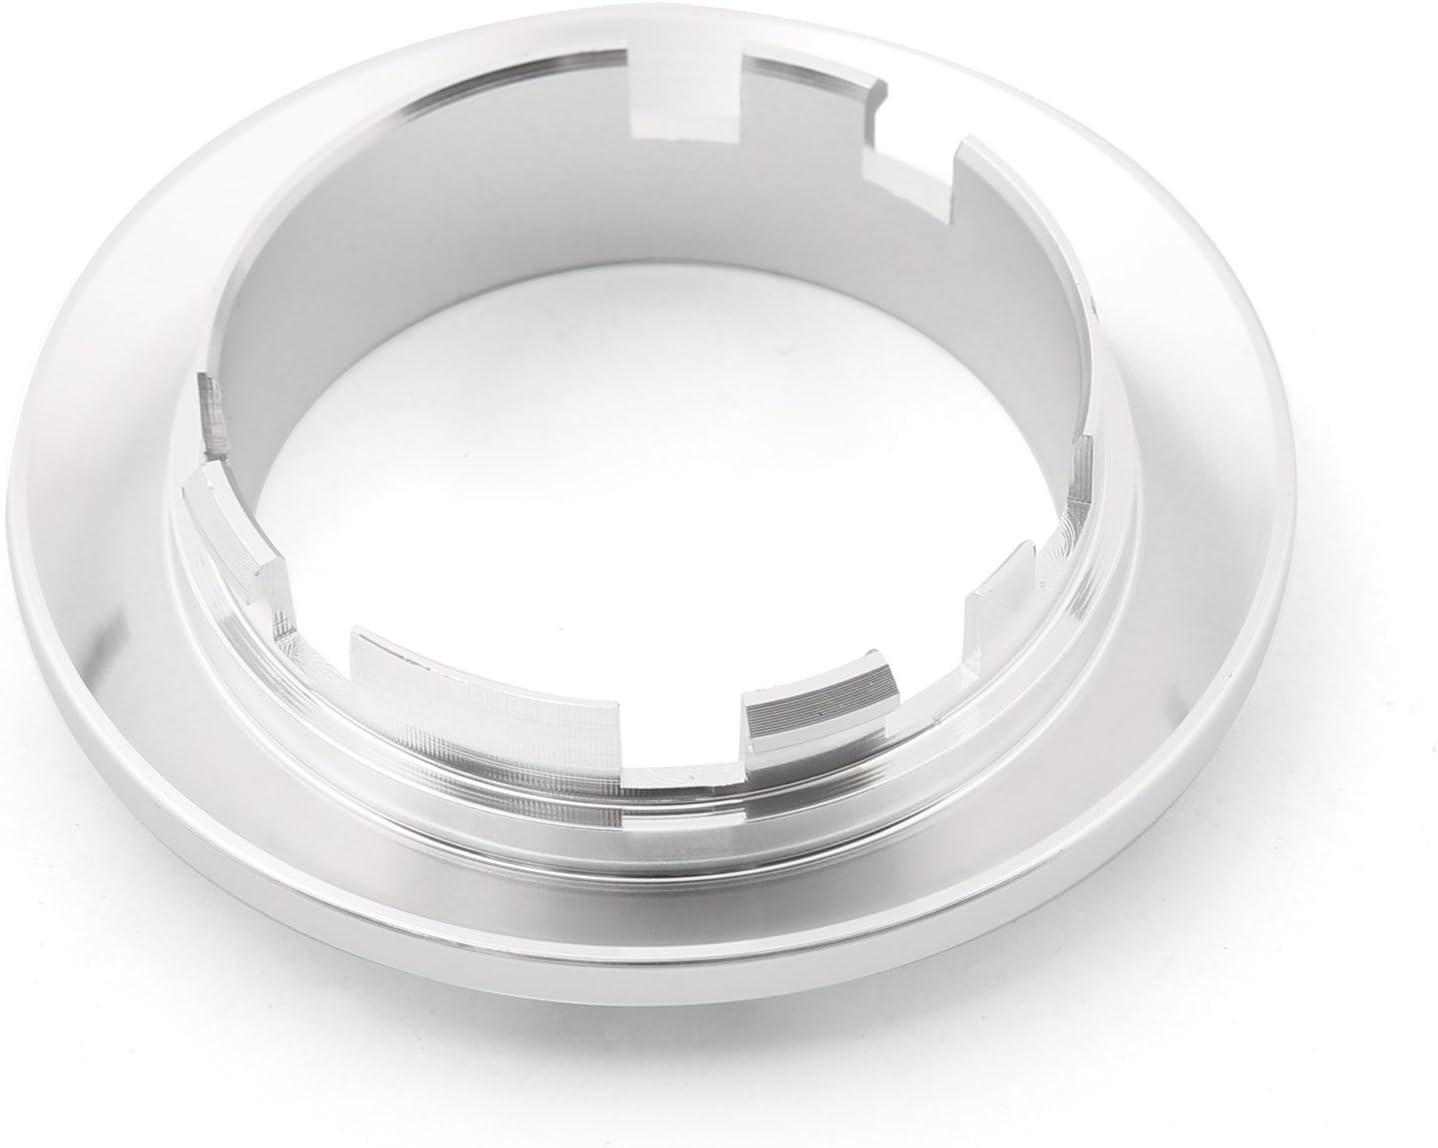 anillo protector para interruptor de encendido para Yamaha TMAX T-MAX 530 2013 2014 2015 Artudatech tapa para interruptor de encendido de motocicleta